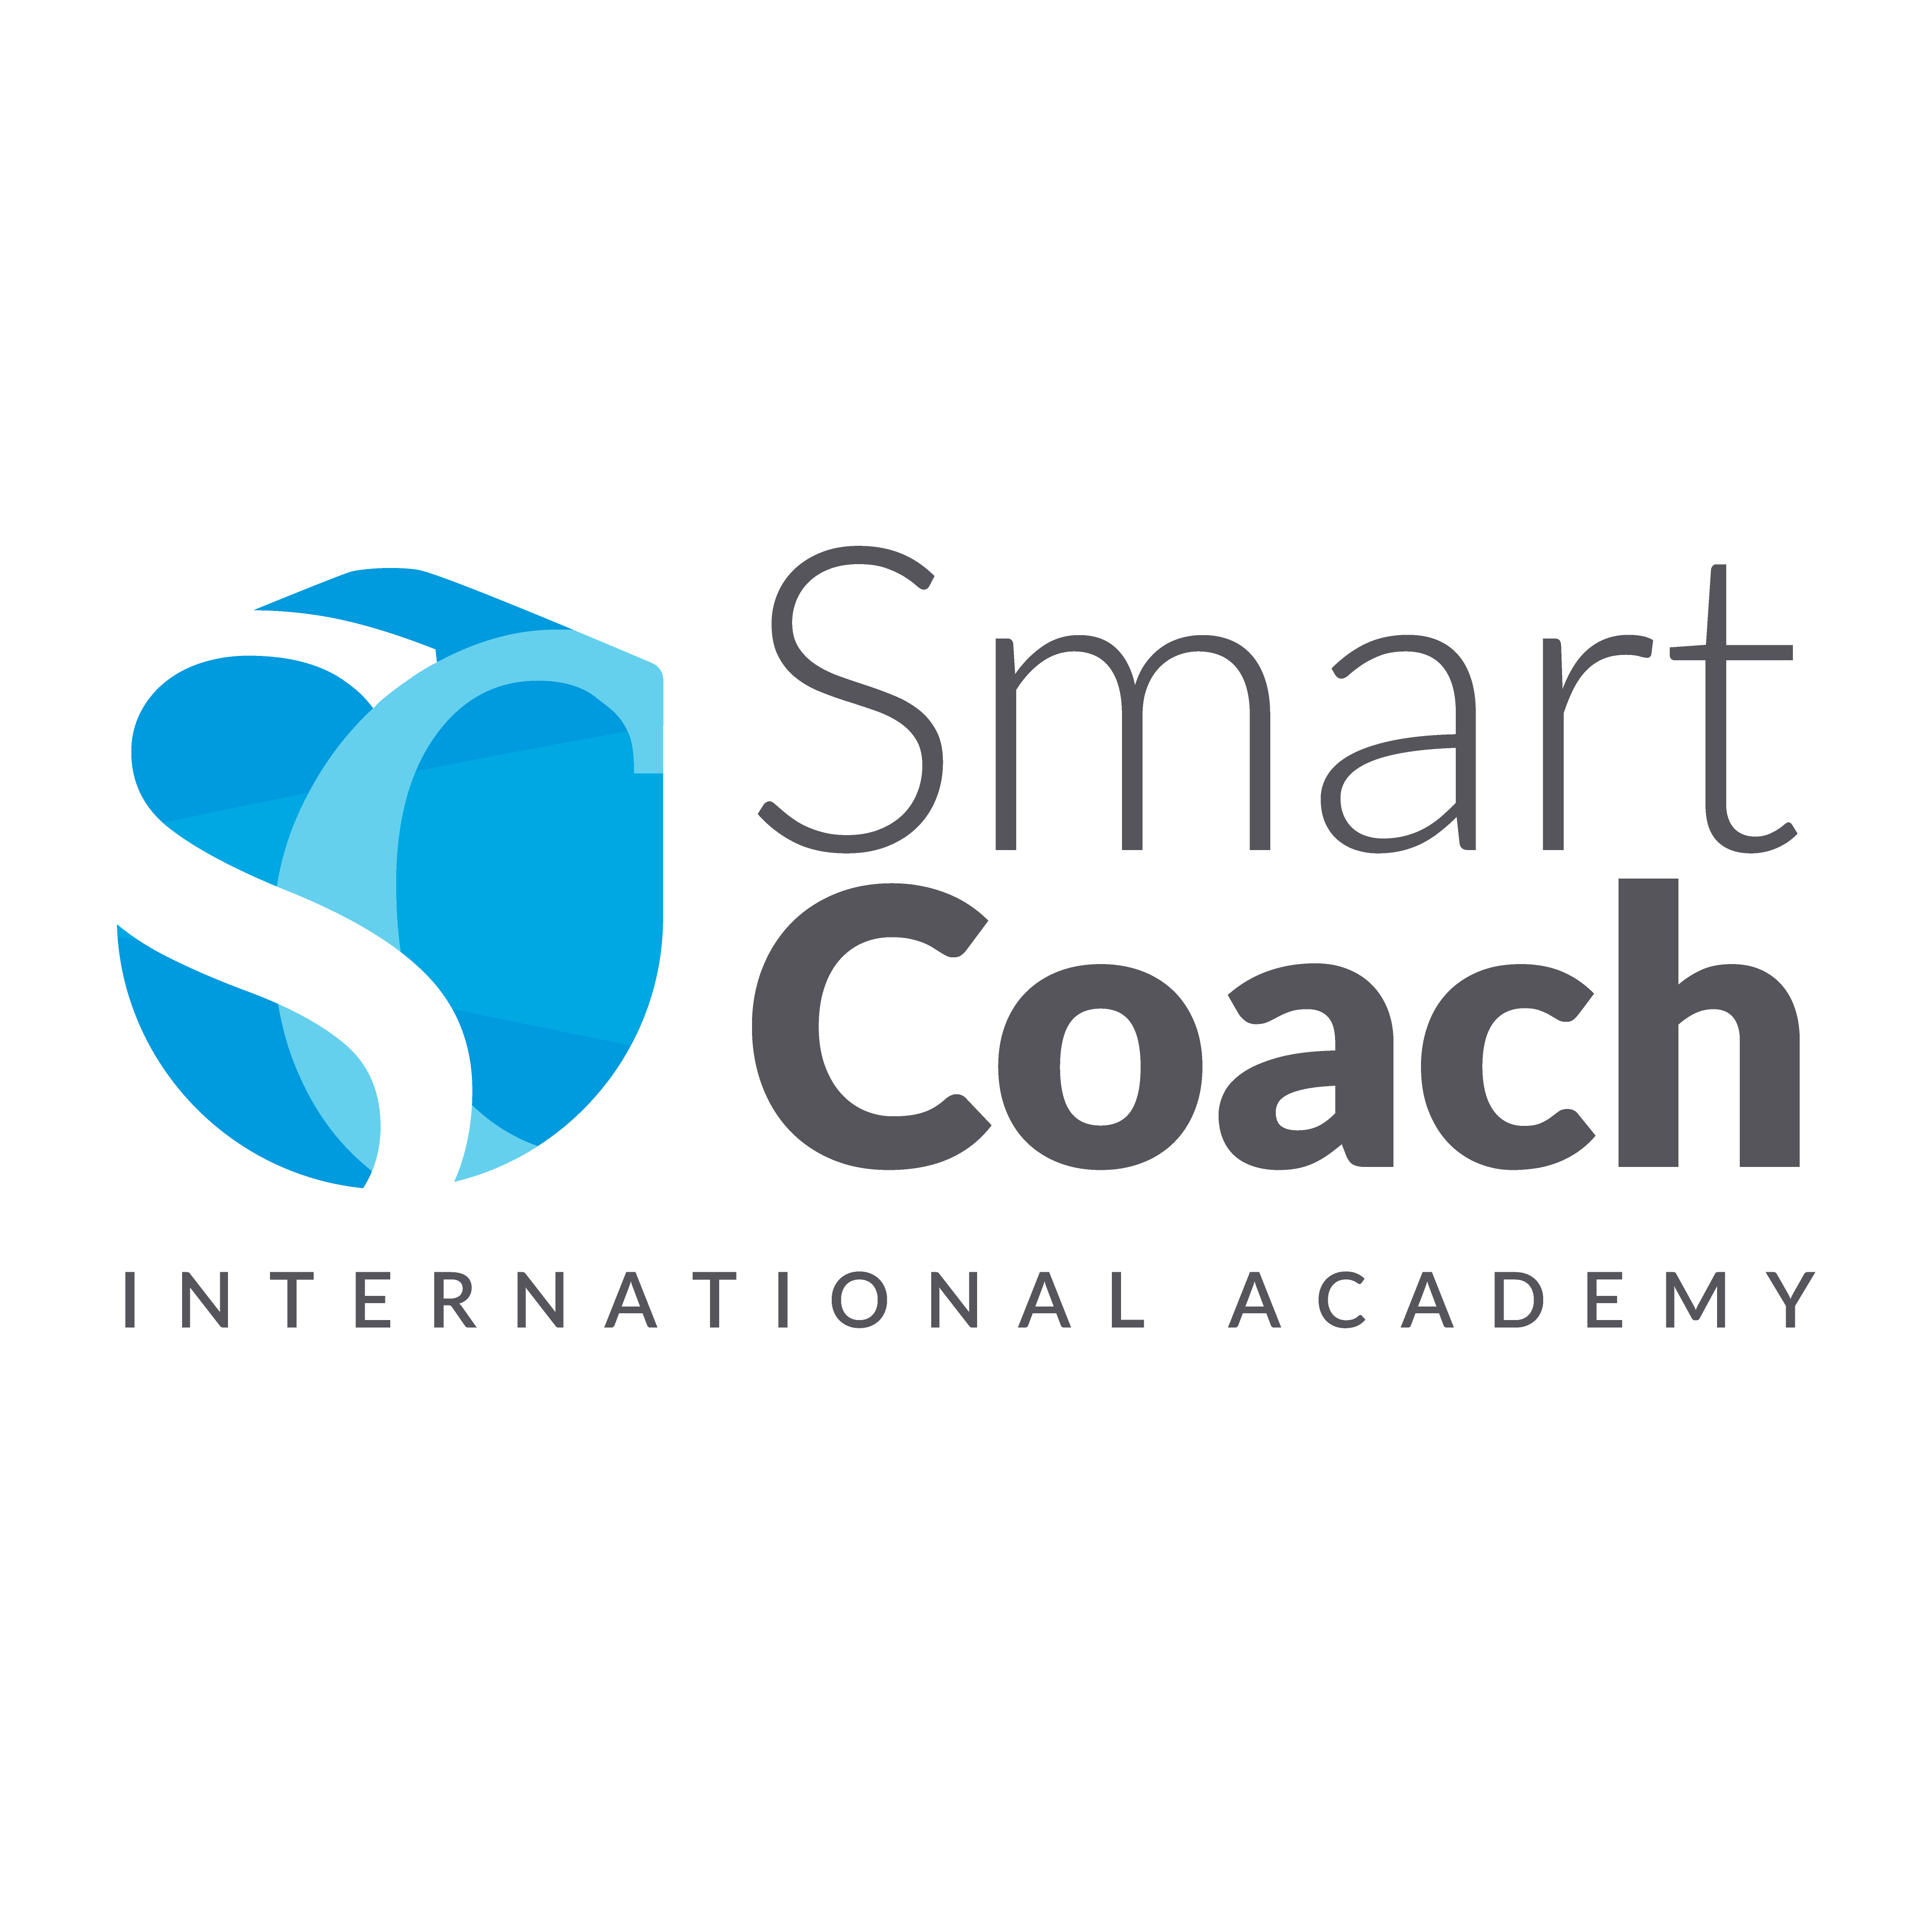 SMART COACH SPA | Certified B Corporation